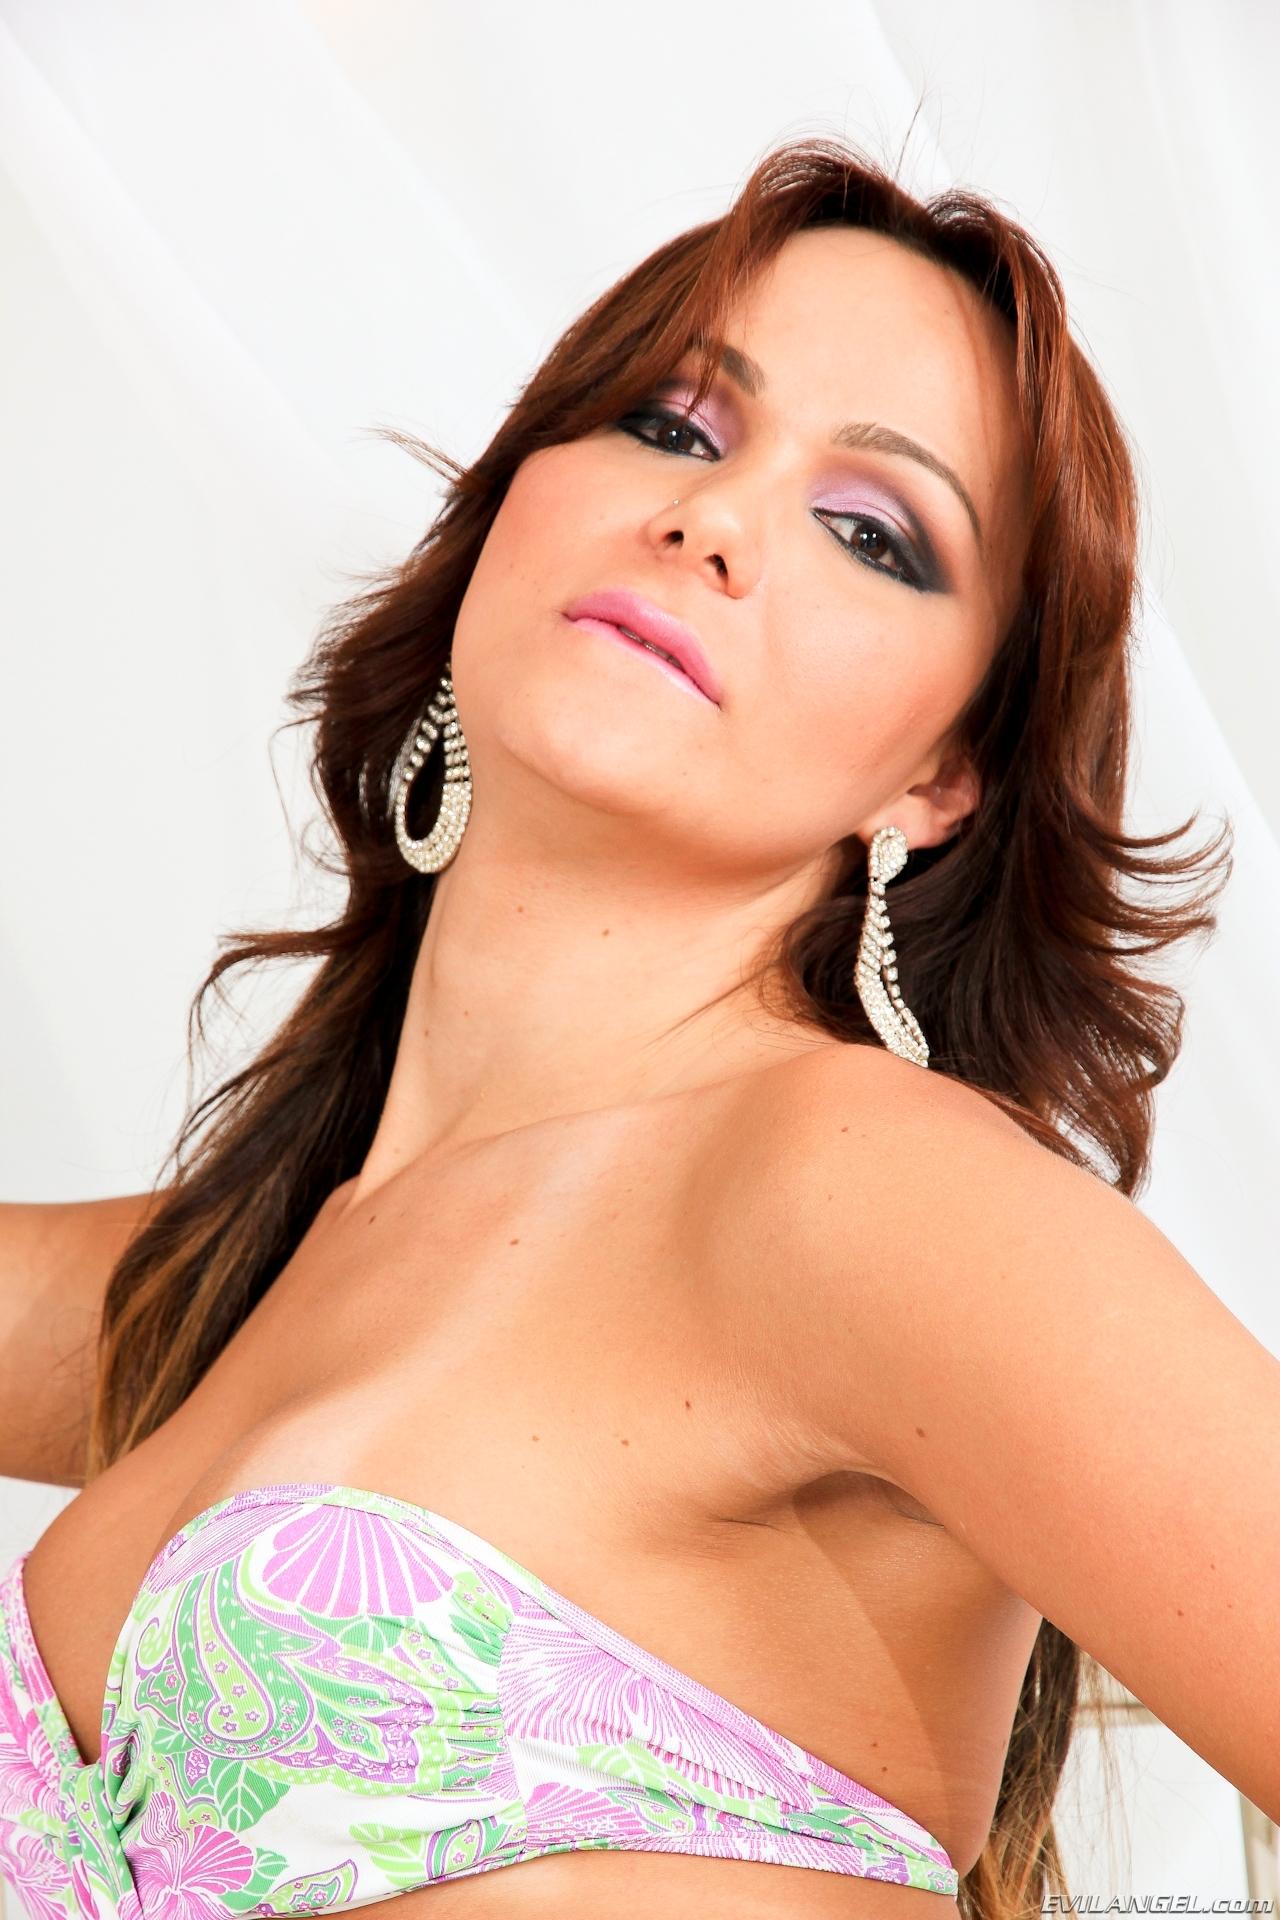 Jessica Hilton In Steamy Swimsuit